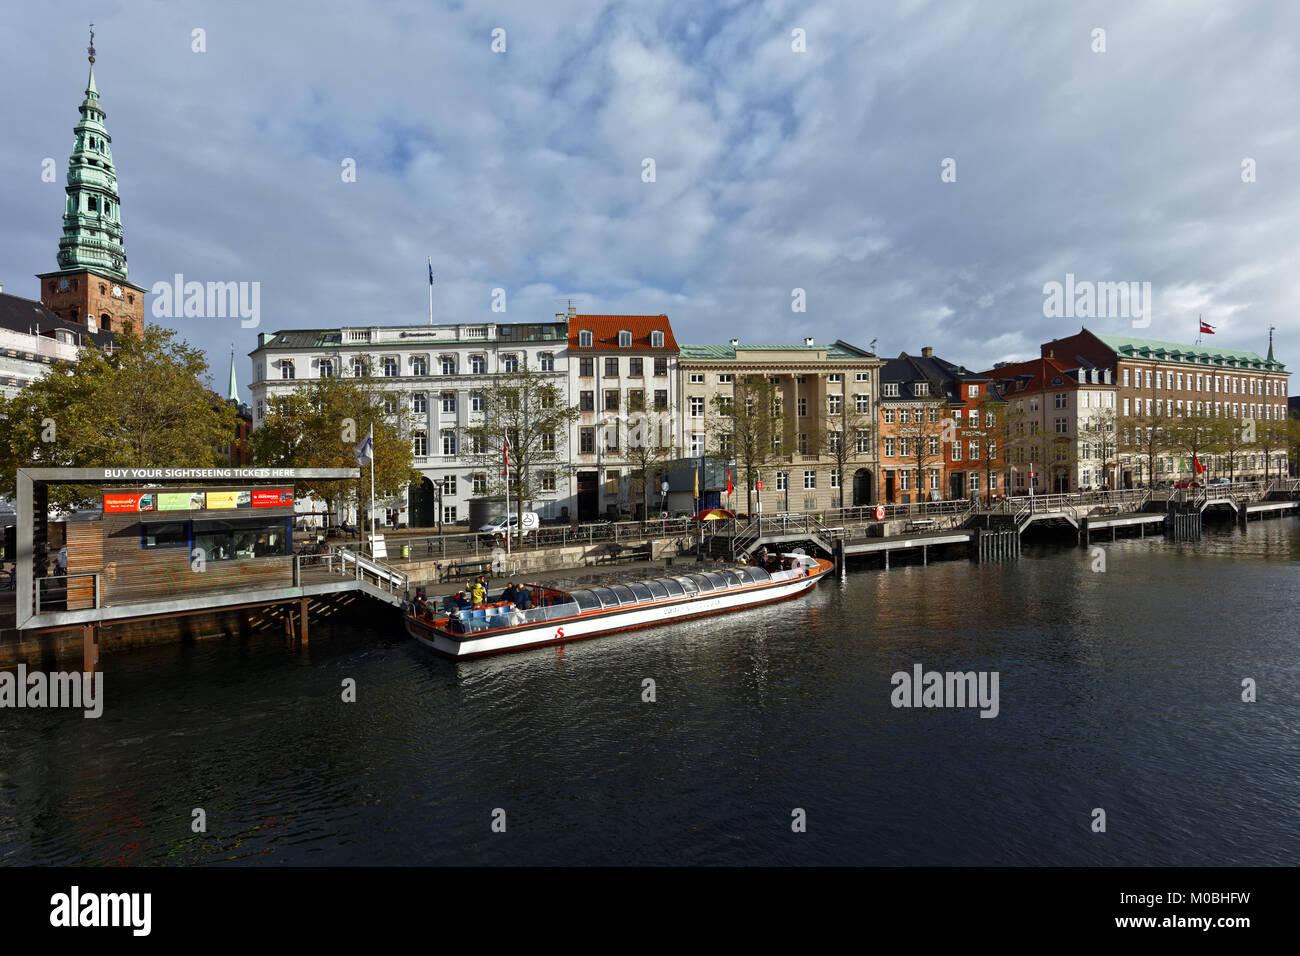 frederiksholms channel 29 metropolis biograf aalborg